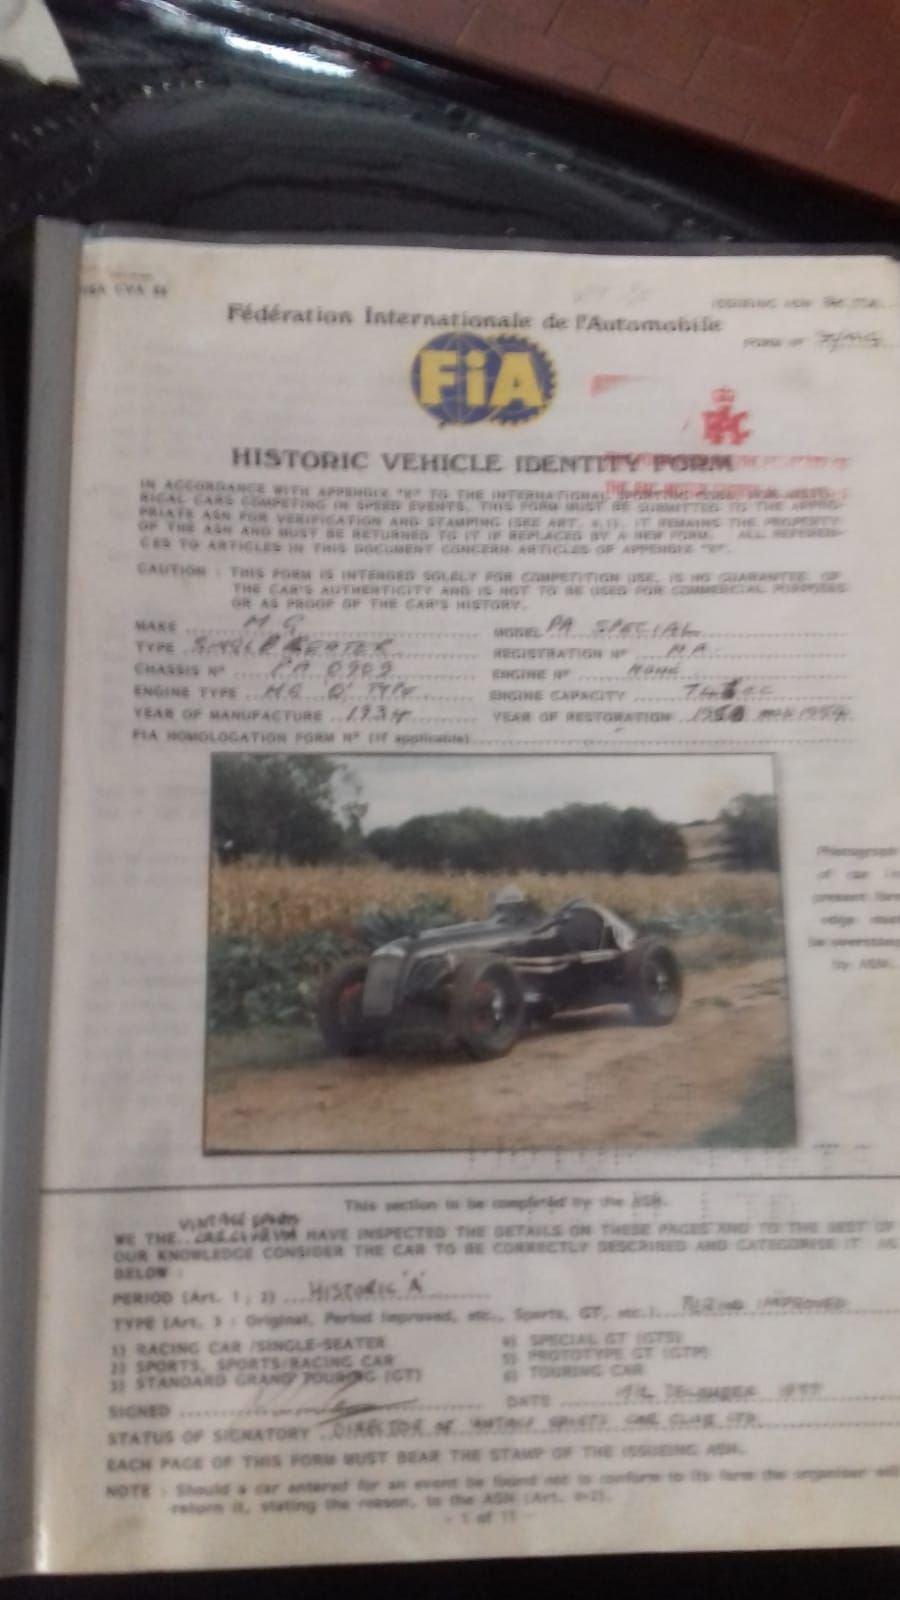 MG  PA SINGLE SEATER 1934 -Palmares-FIA Fiche .Vol.Compres.  For Sale (picture 5 of 6)